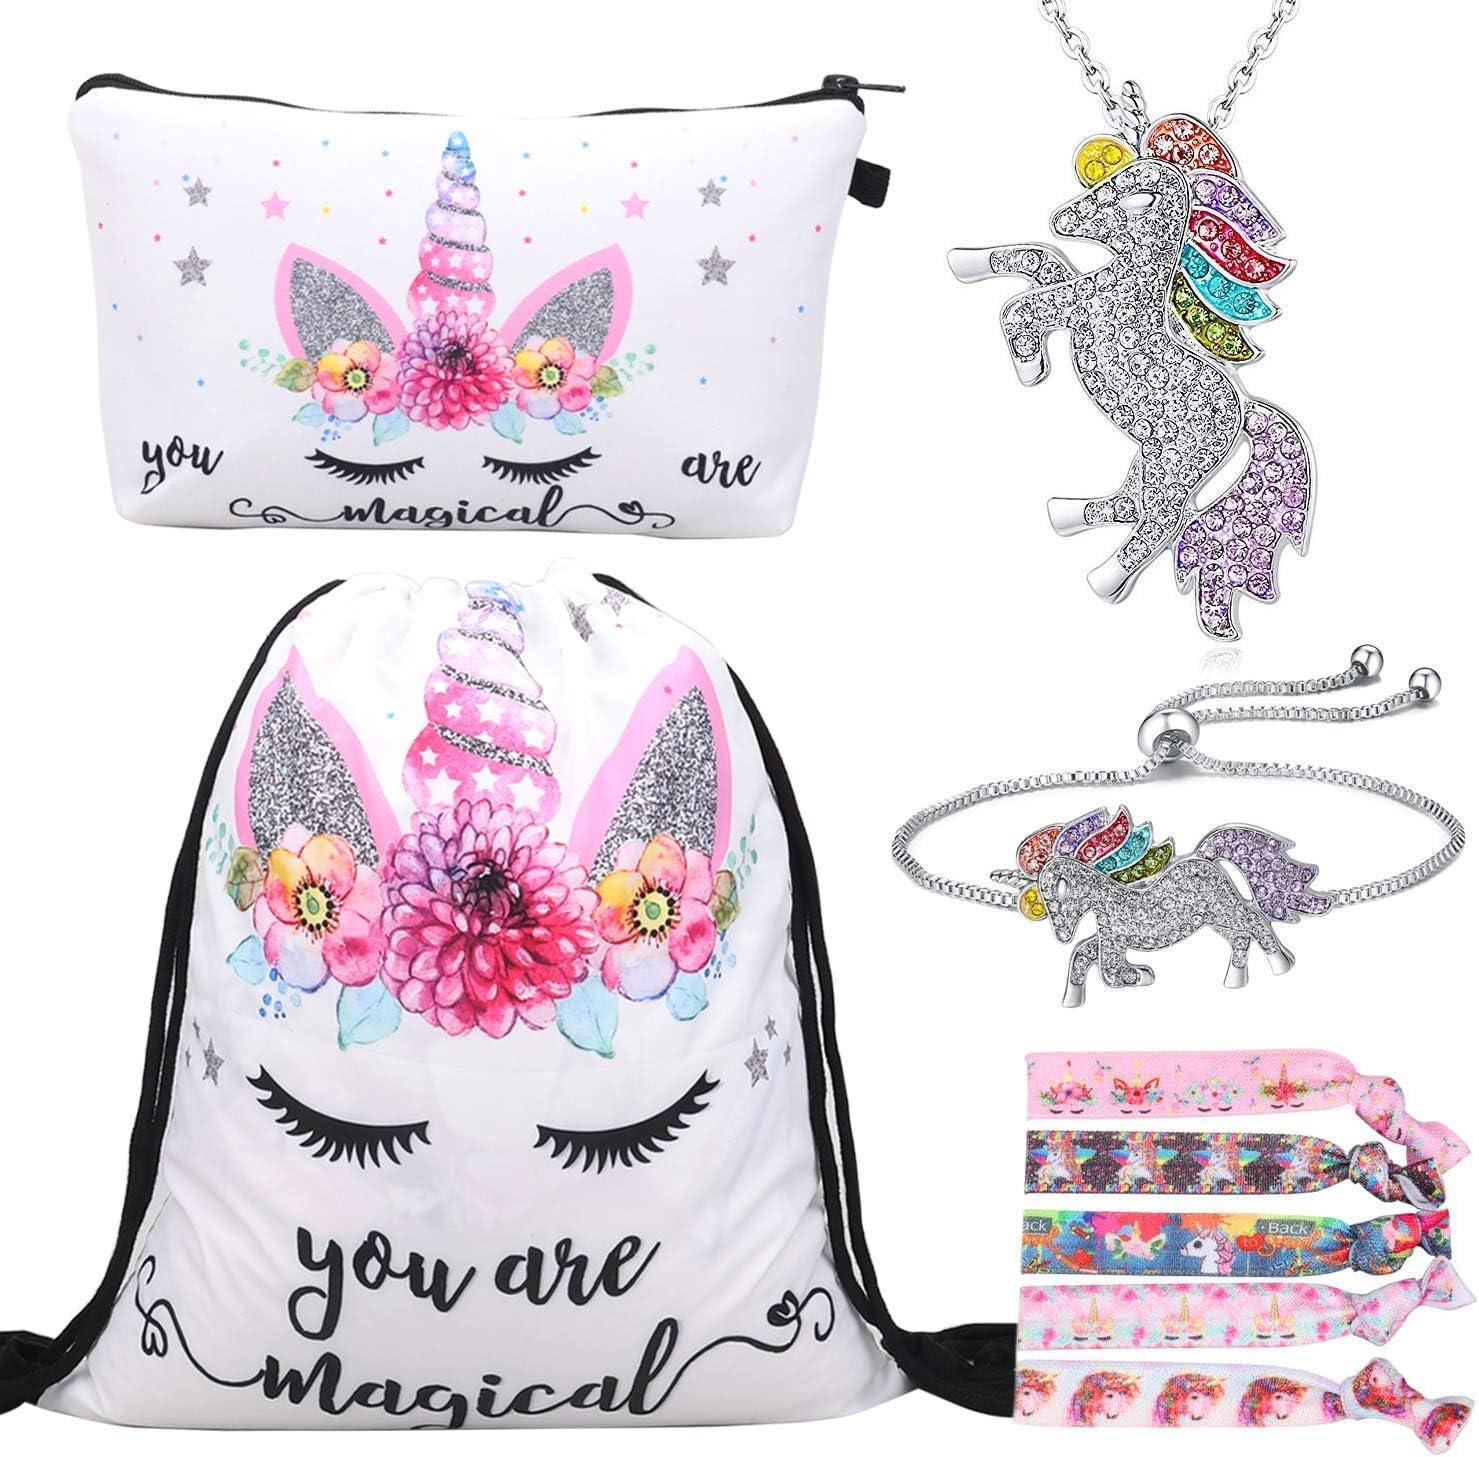 Mochila con cord/ón Bags//Maquillaje Bolsa//Collar Aleaci/ón Cadena//Lazos para el Cabello RLGPBON Pack de 5 Regalos de Unicornio para ni/ñas